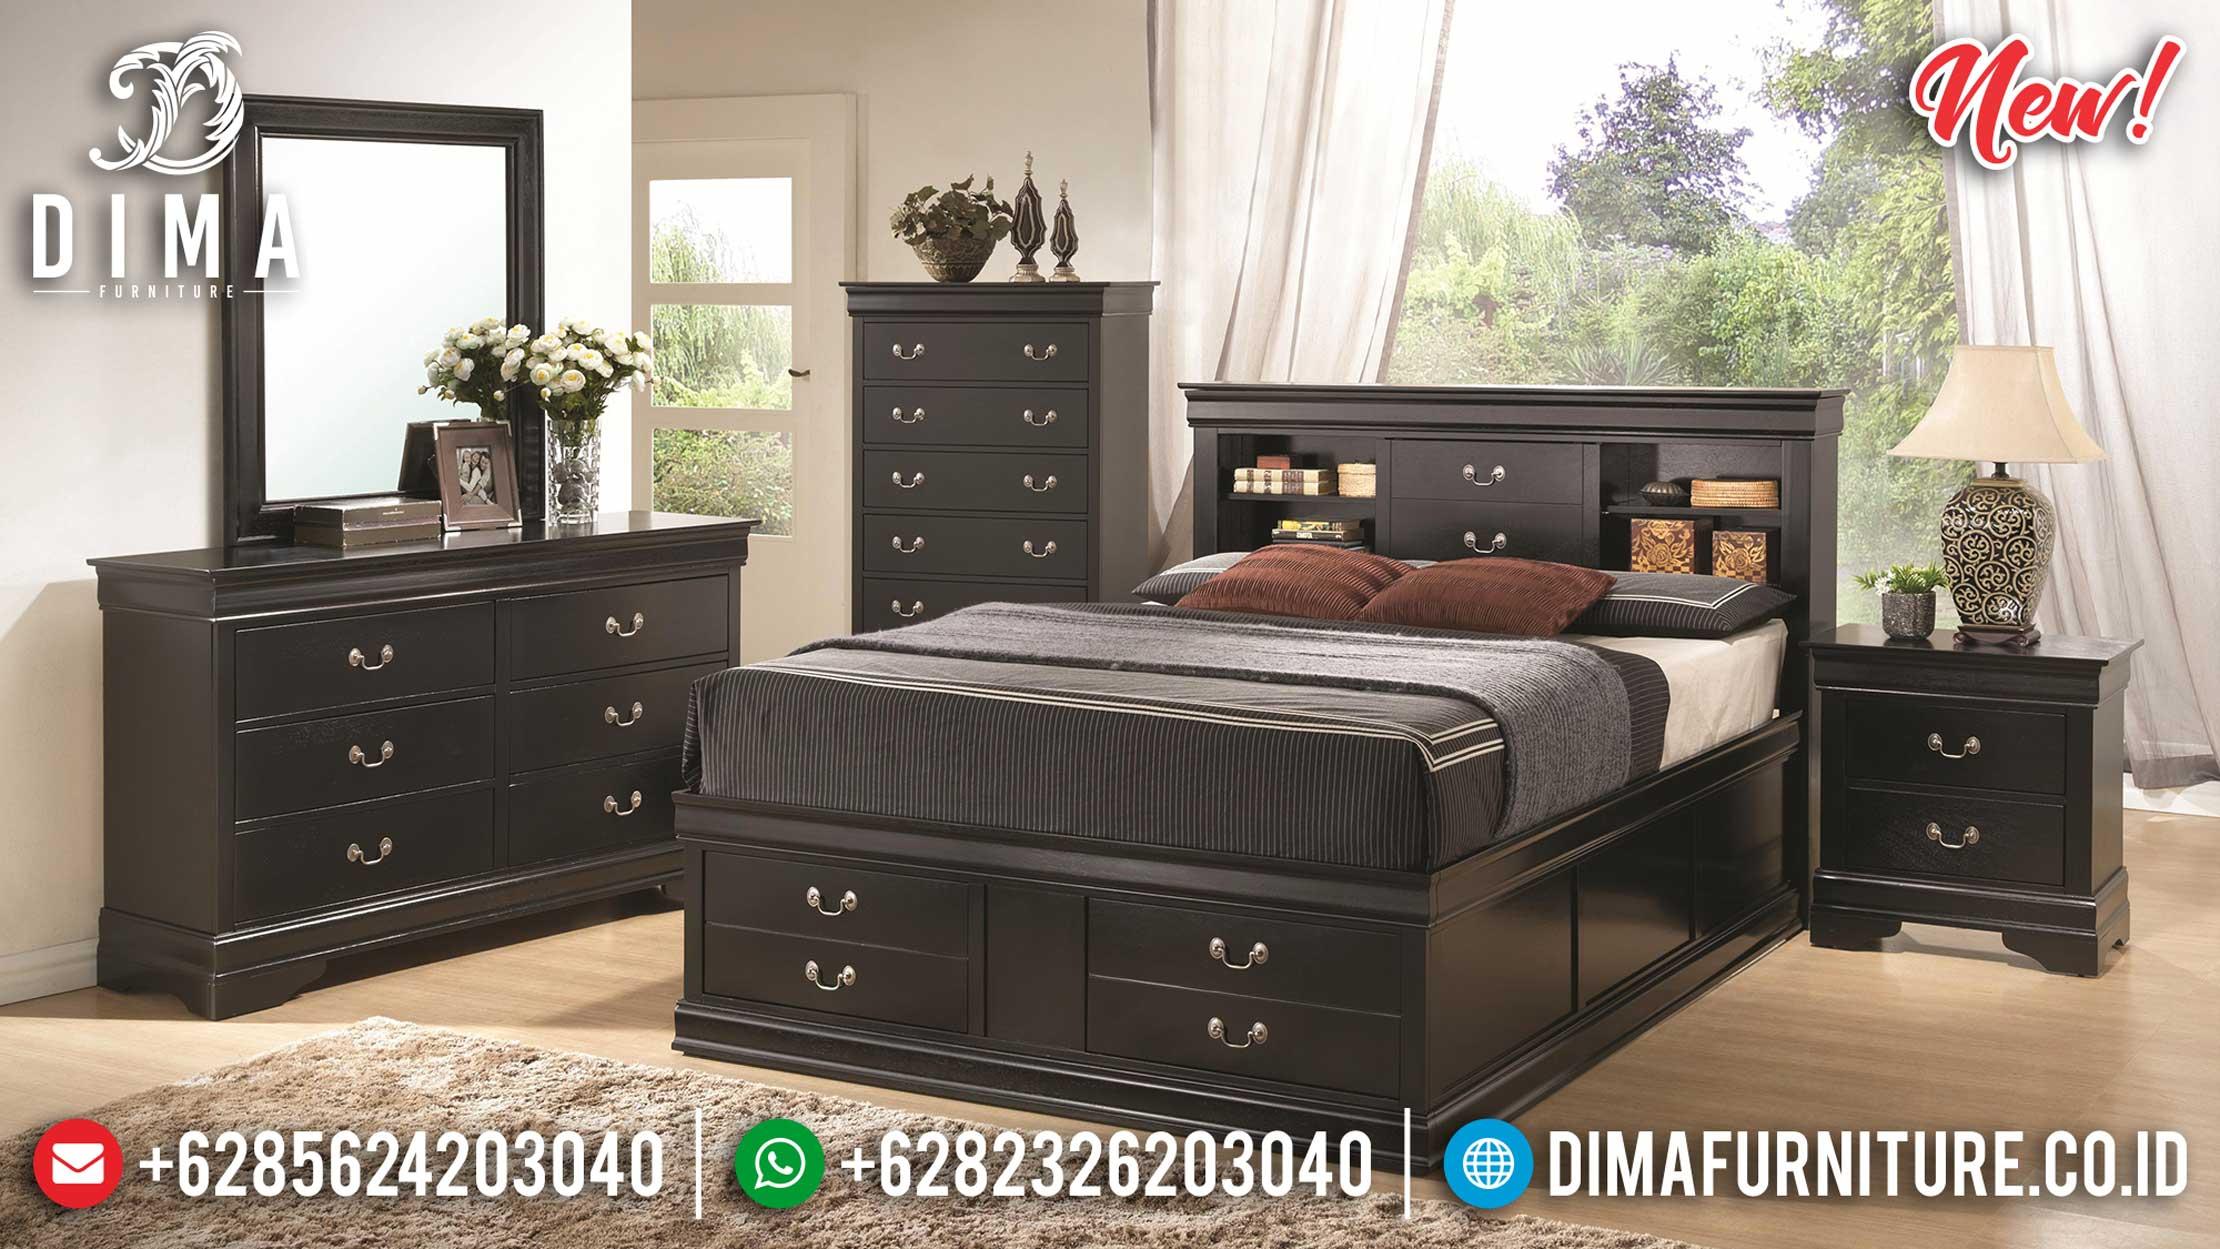 New Desain Tempat Tidur Minimalis Model Laci Black Elegant Color BT-0926